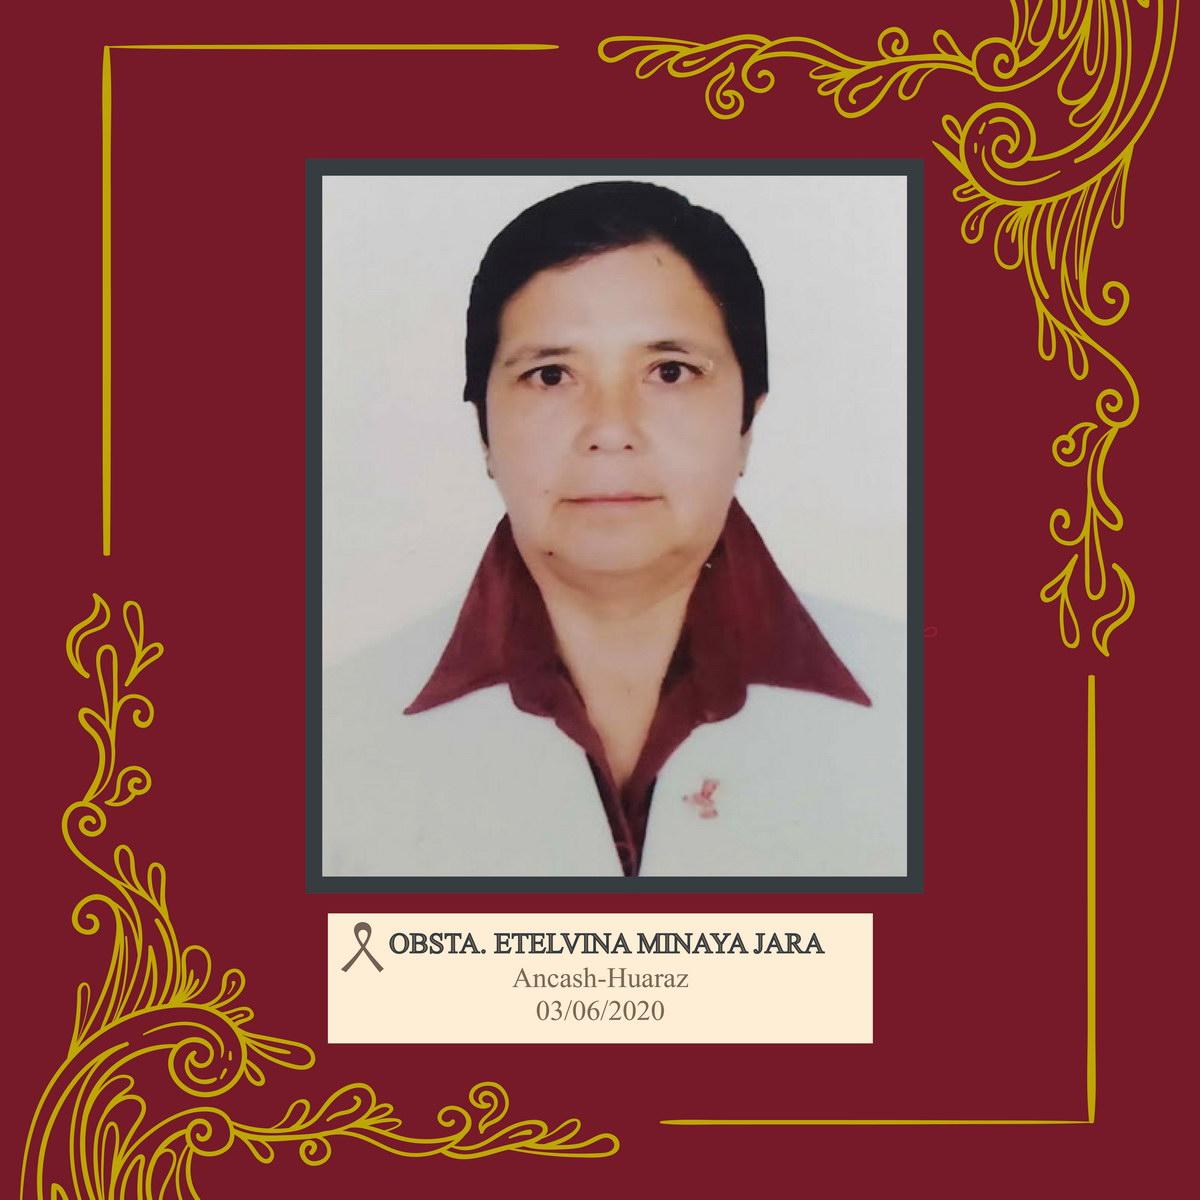 Etelvina Minaya Jara